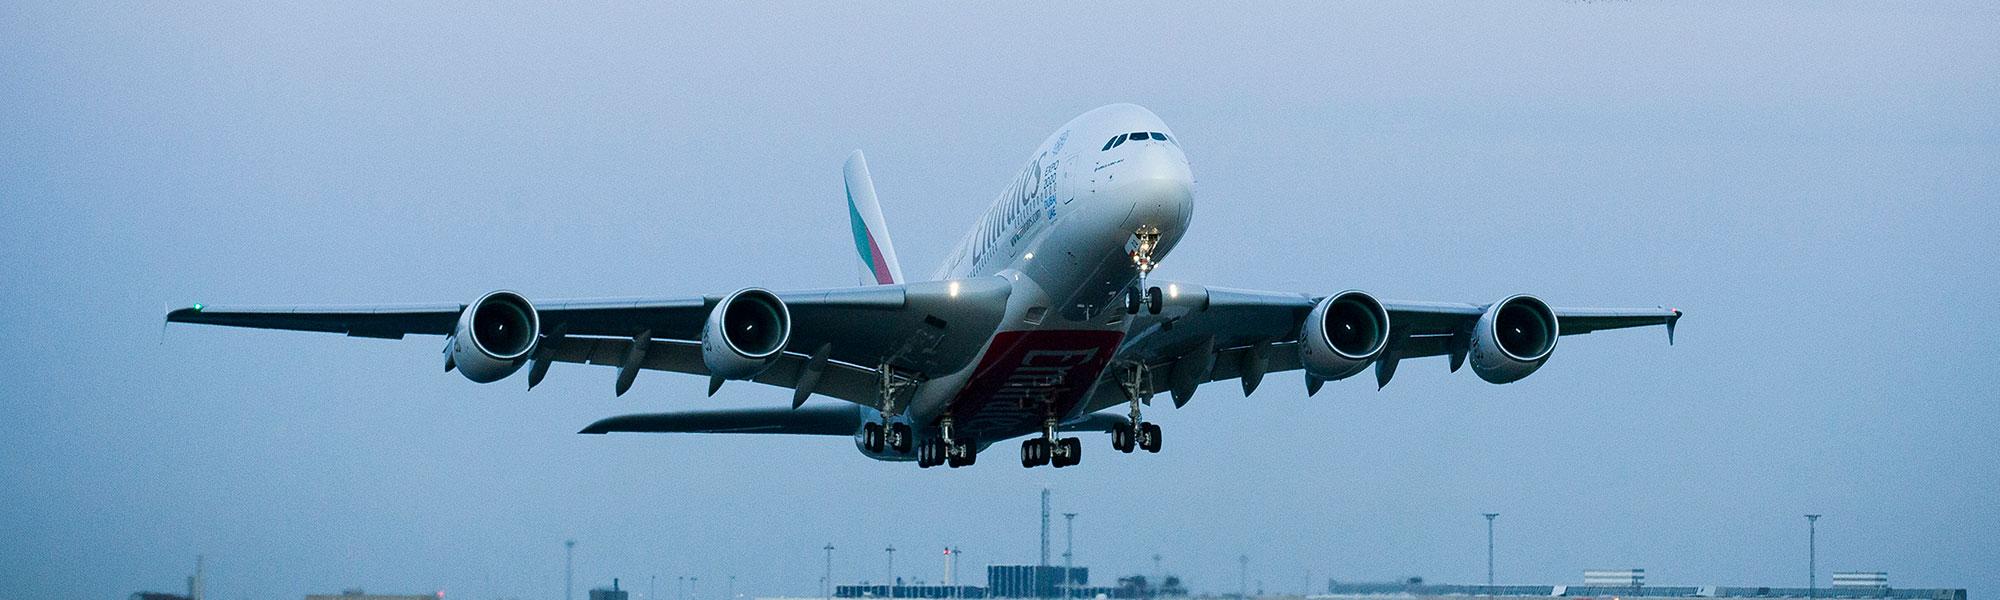 Emirates - Takeoff